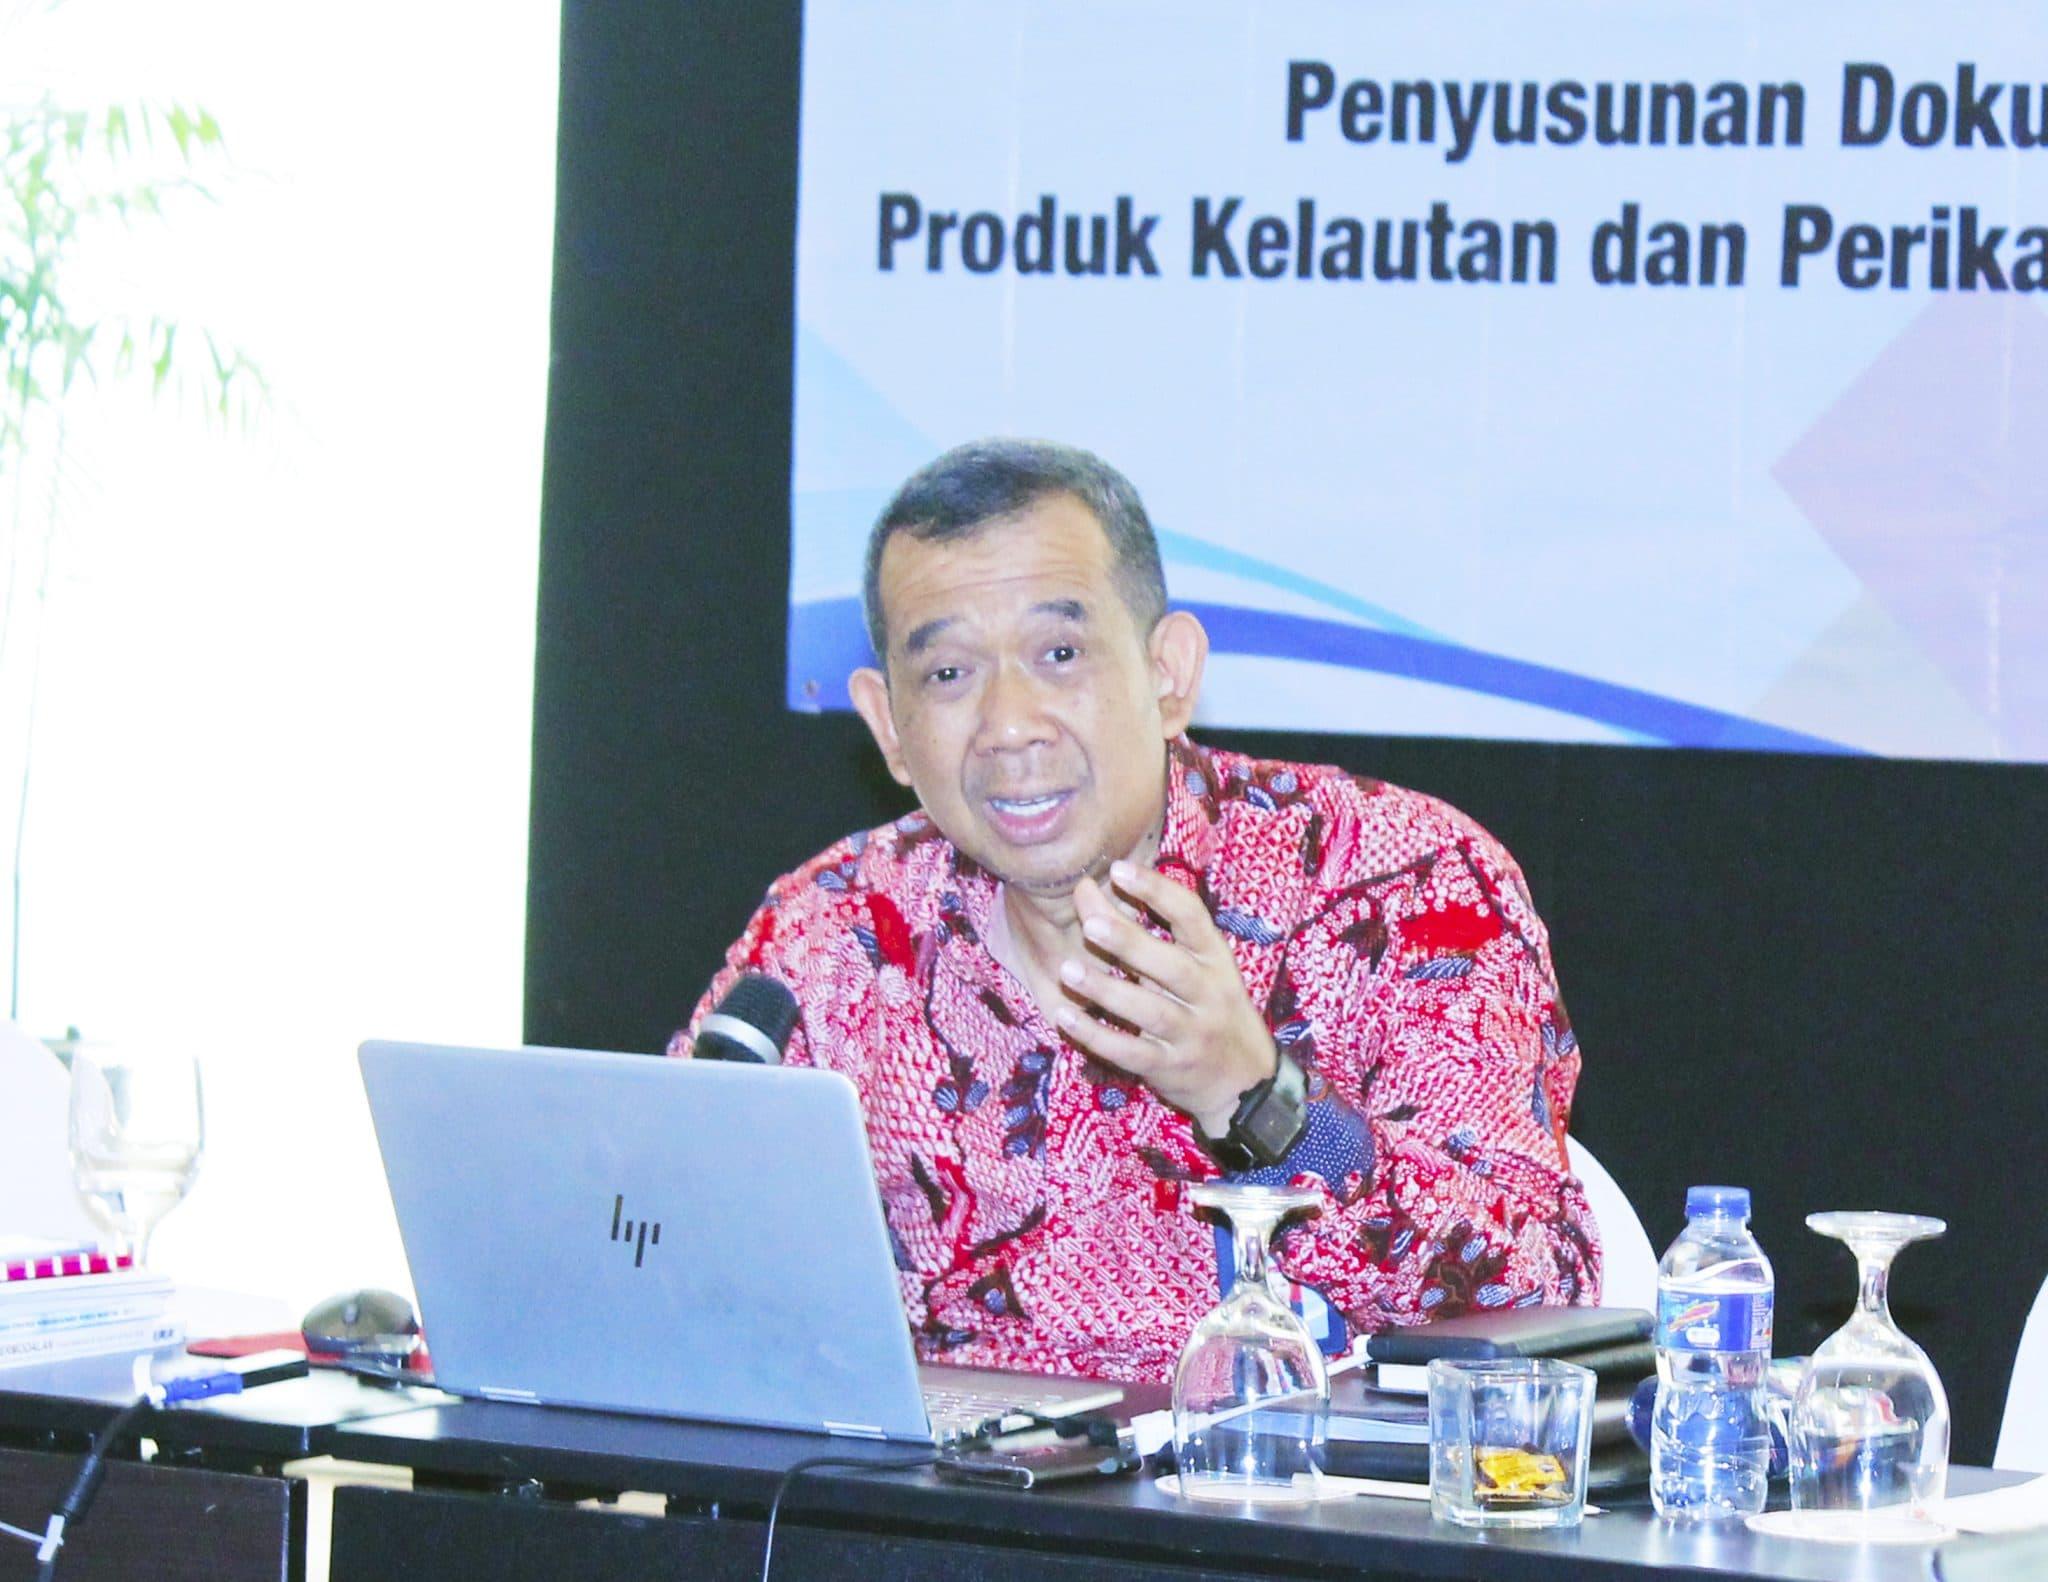 Kemenko Maritim Inisiasi Dokumen Klastering Industri Inovasi Produk Kelautan dan Industri Perikanan Unggulan